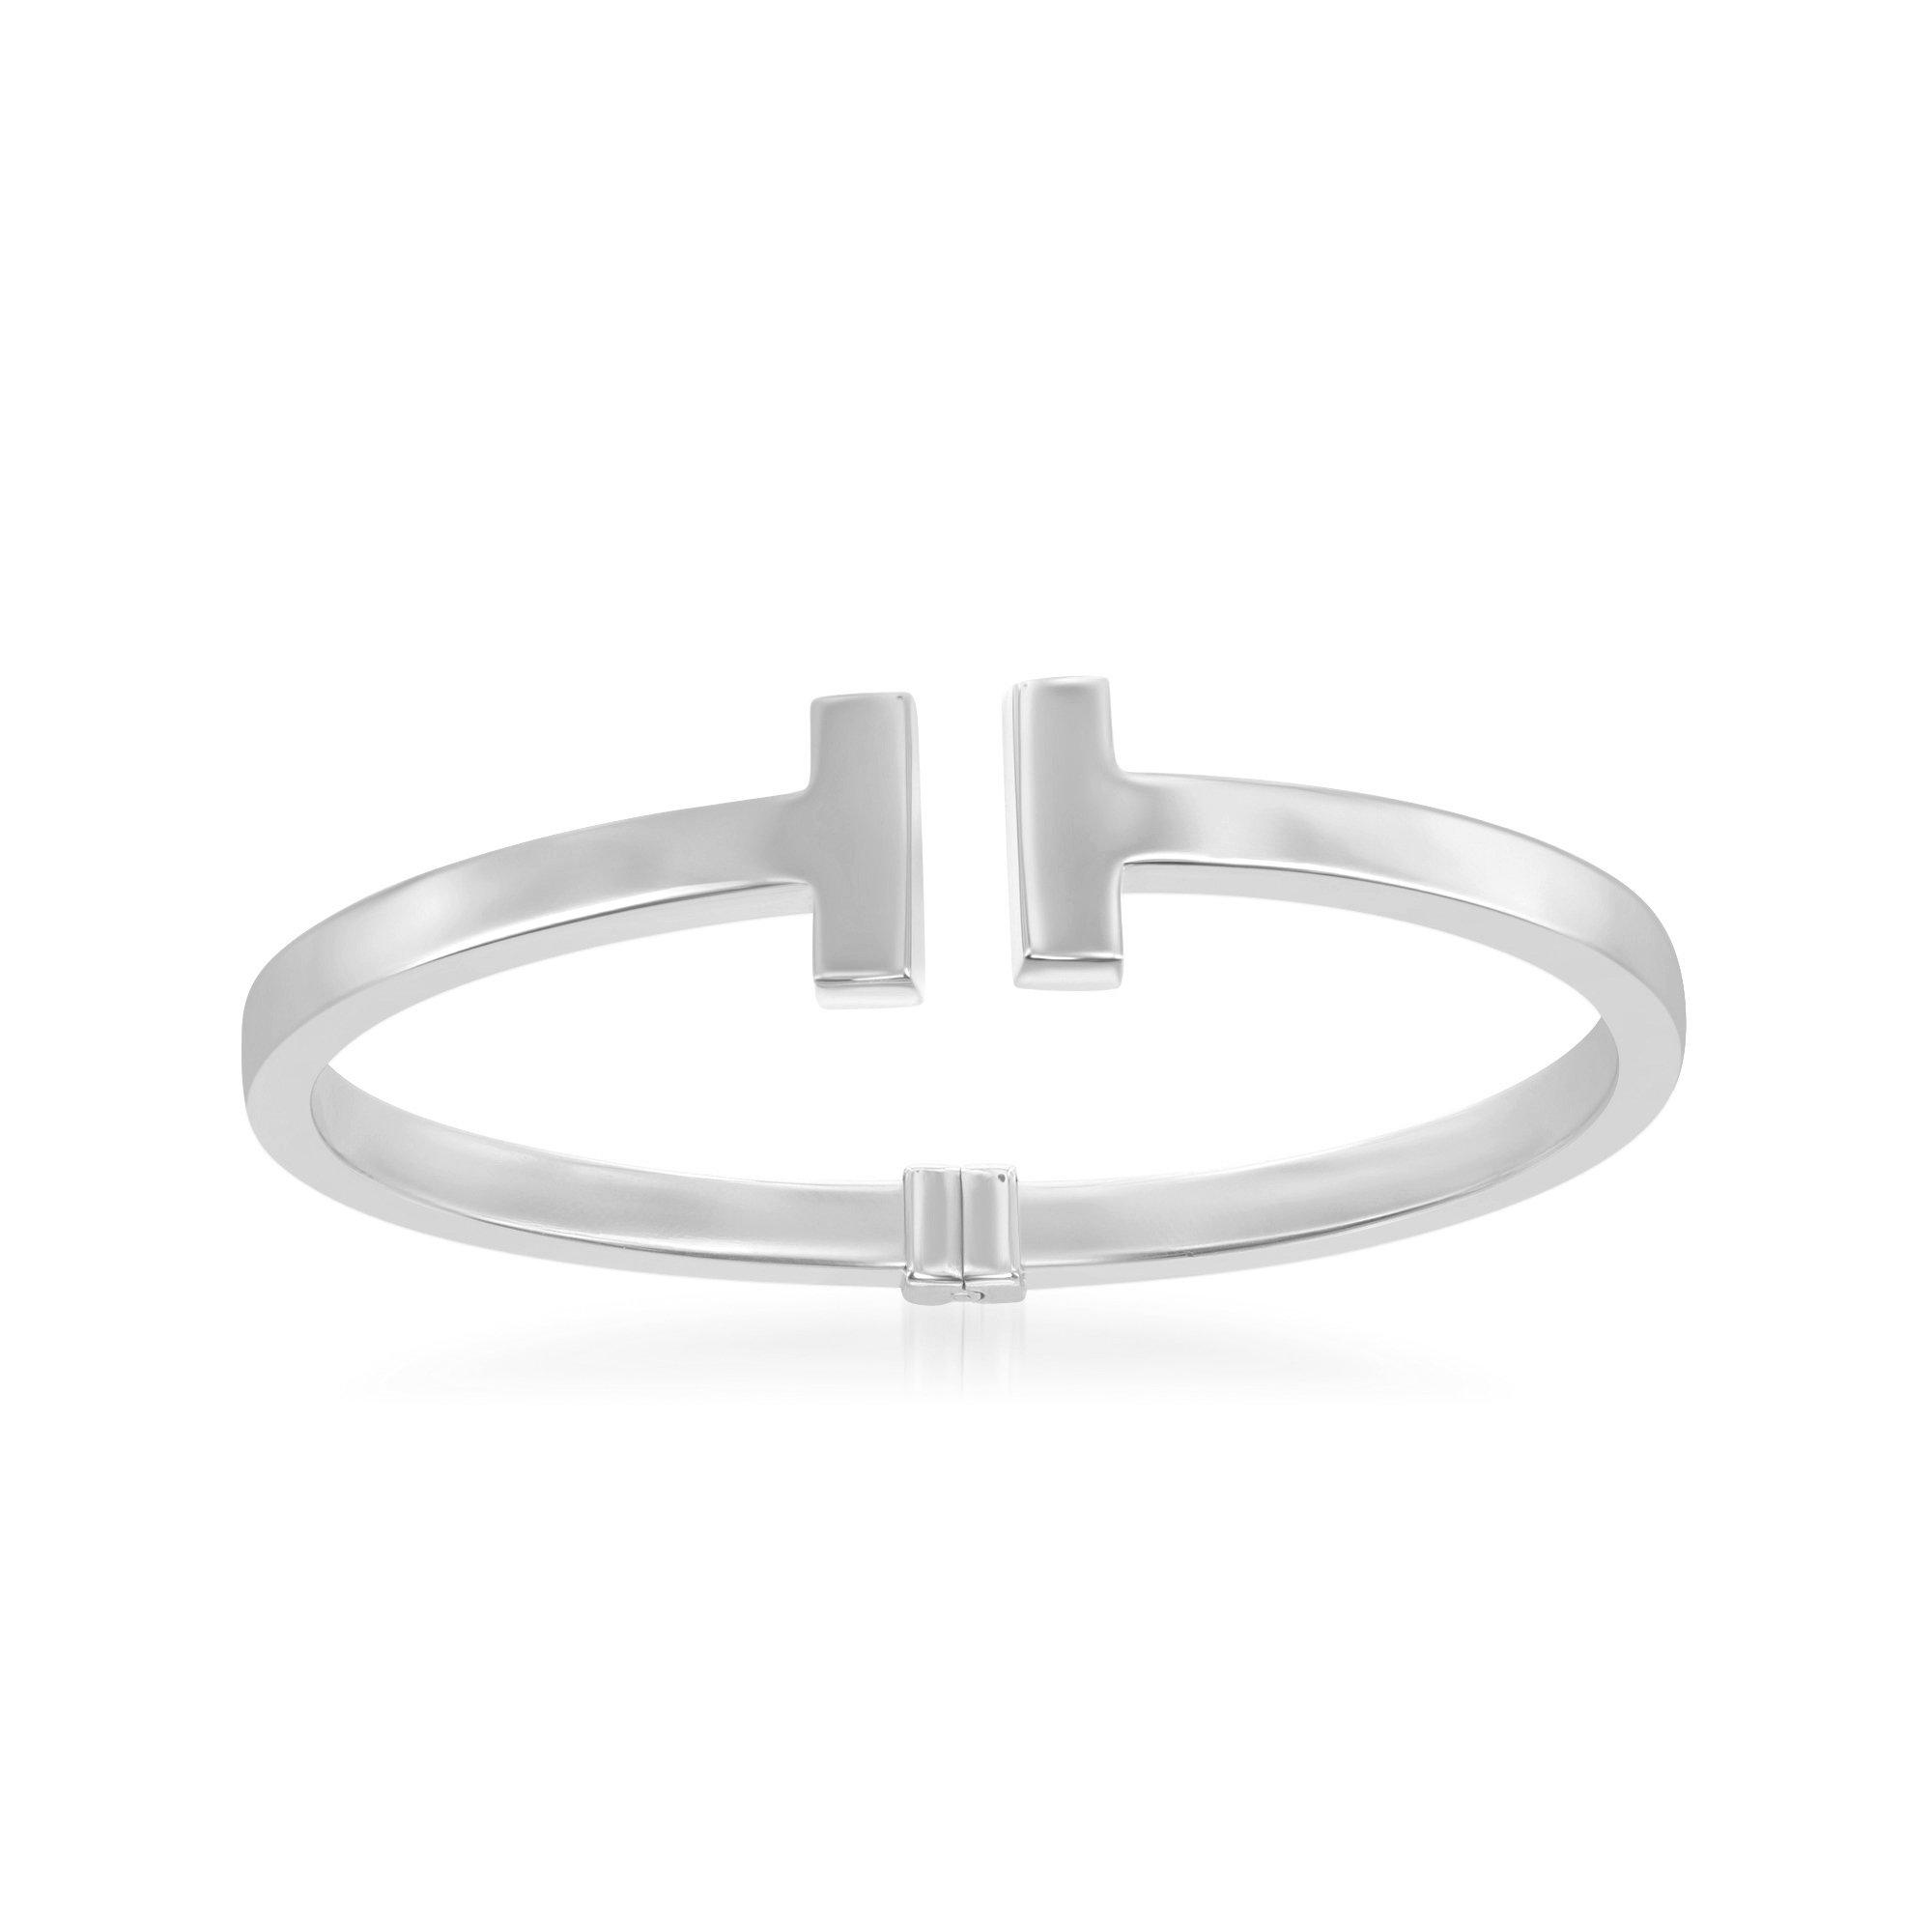 Sterling Silver High Polish Italian Double T Bar Hinged Cuff Bangle Bracelet